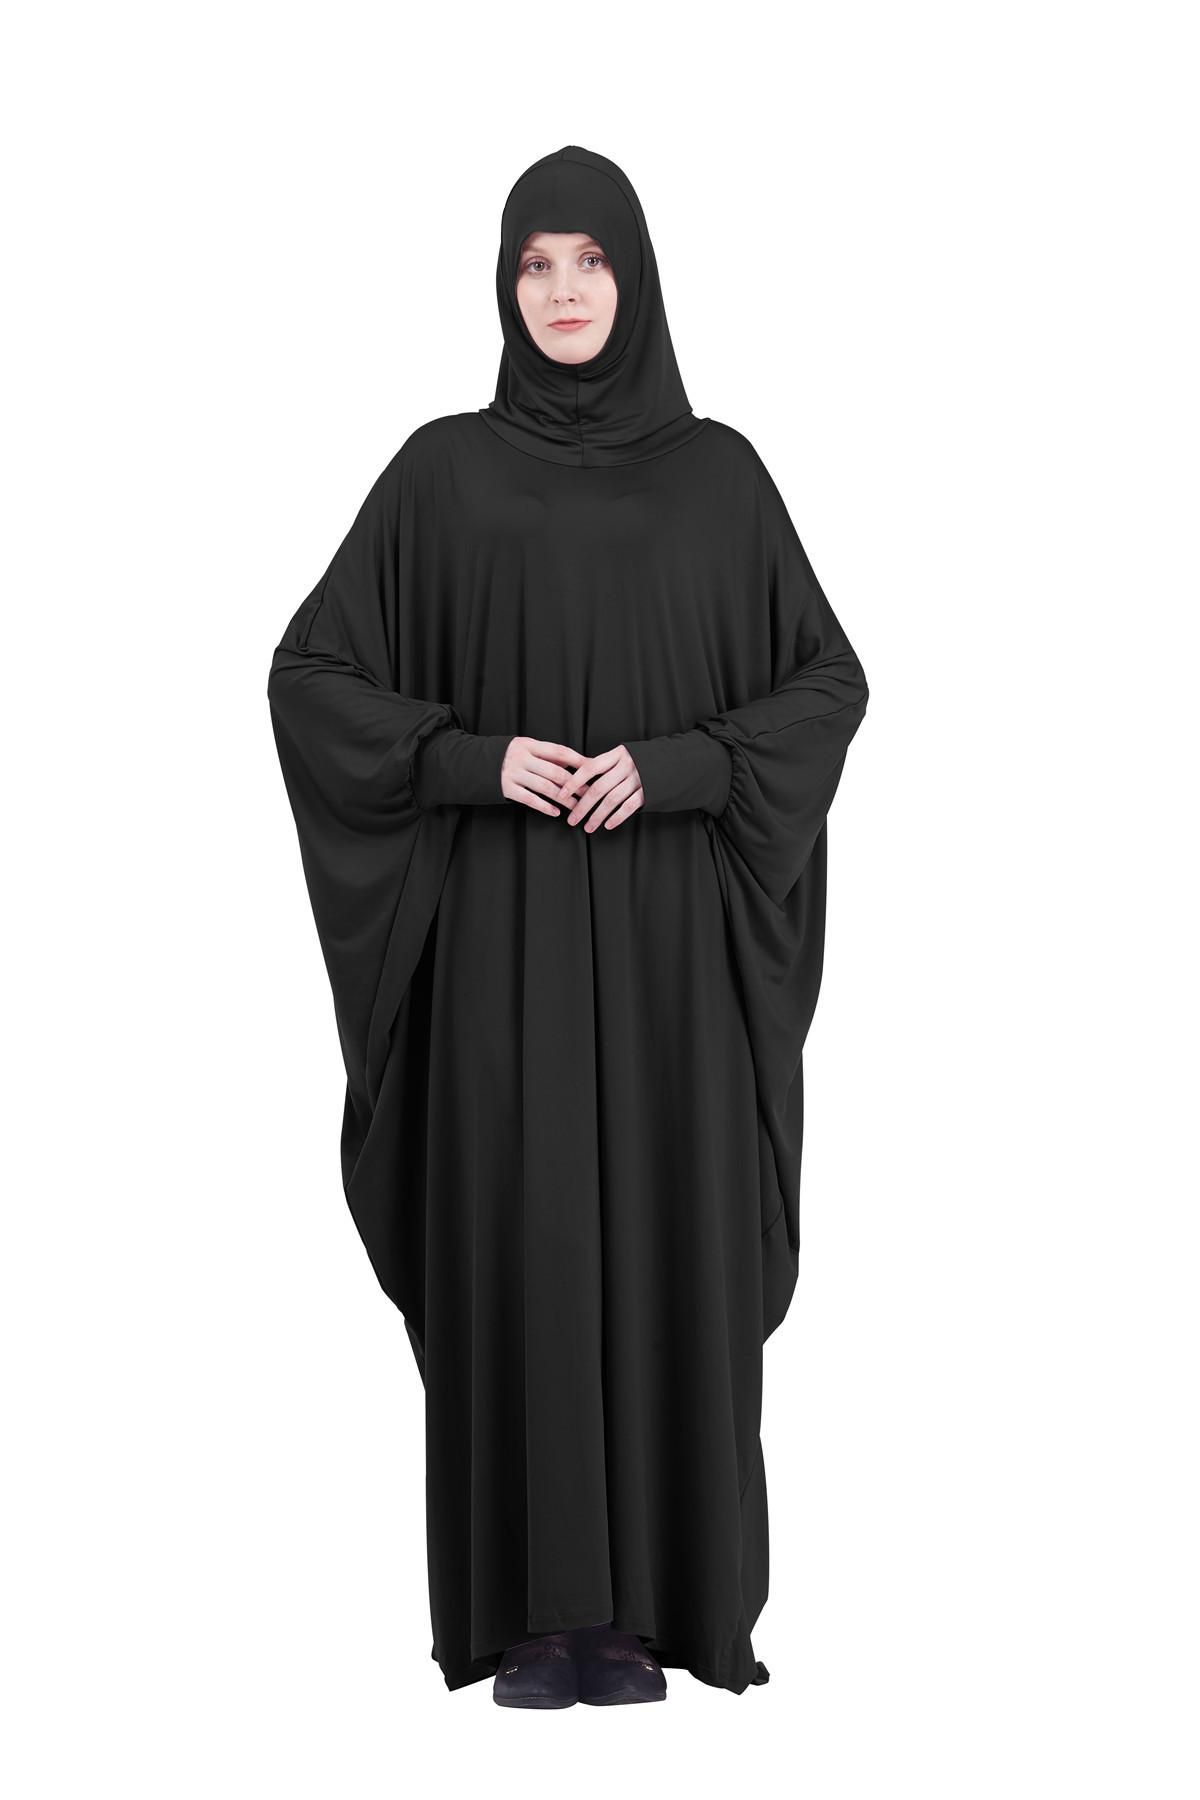 Image 3 - Abaya Kaftan Jilbab Full Cover Prayer Garment Hijab Long Maxi  Dress Overhead Muslim Robe Gown Solid Color Loose Dresses  FashionIslamic Clothing